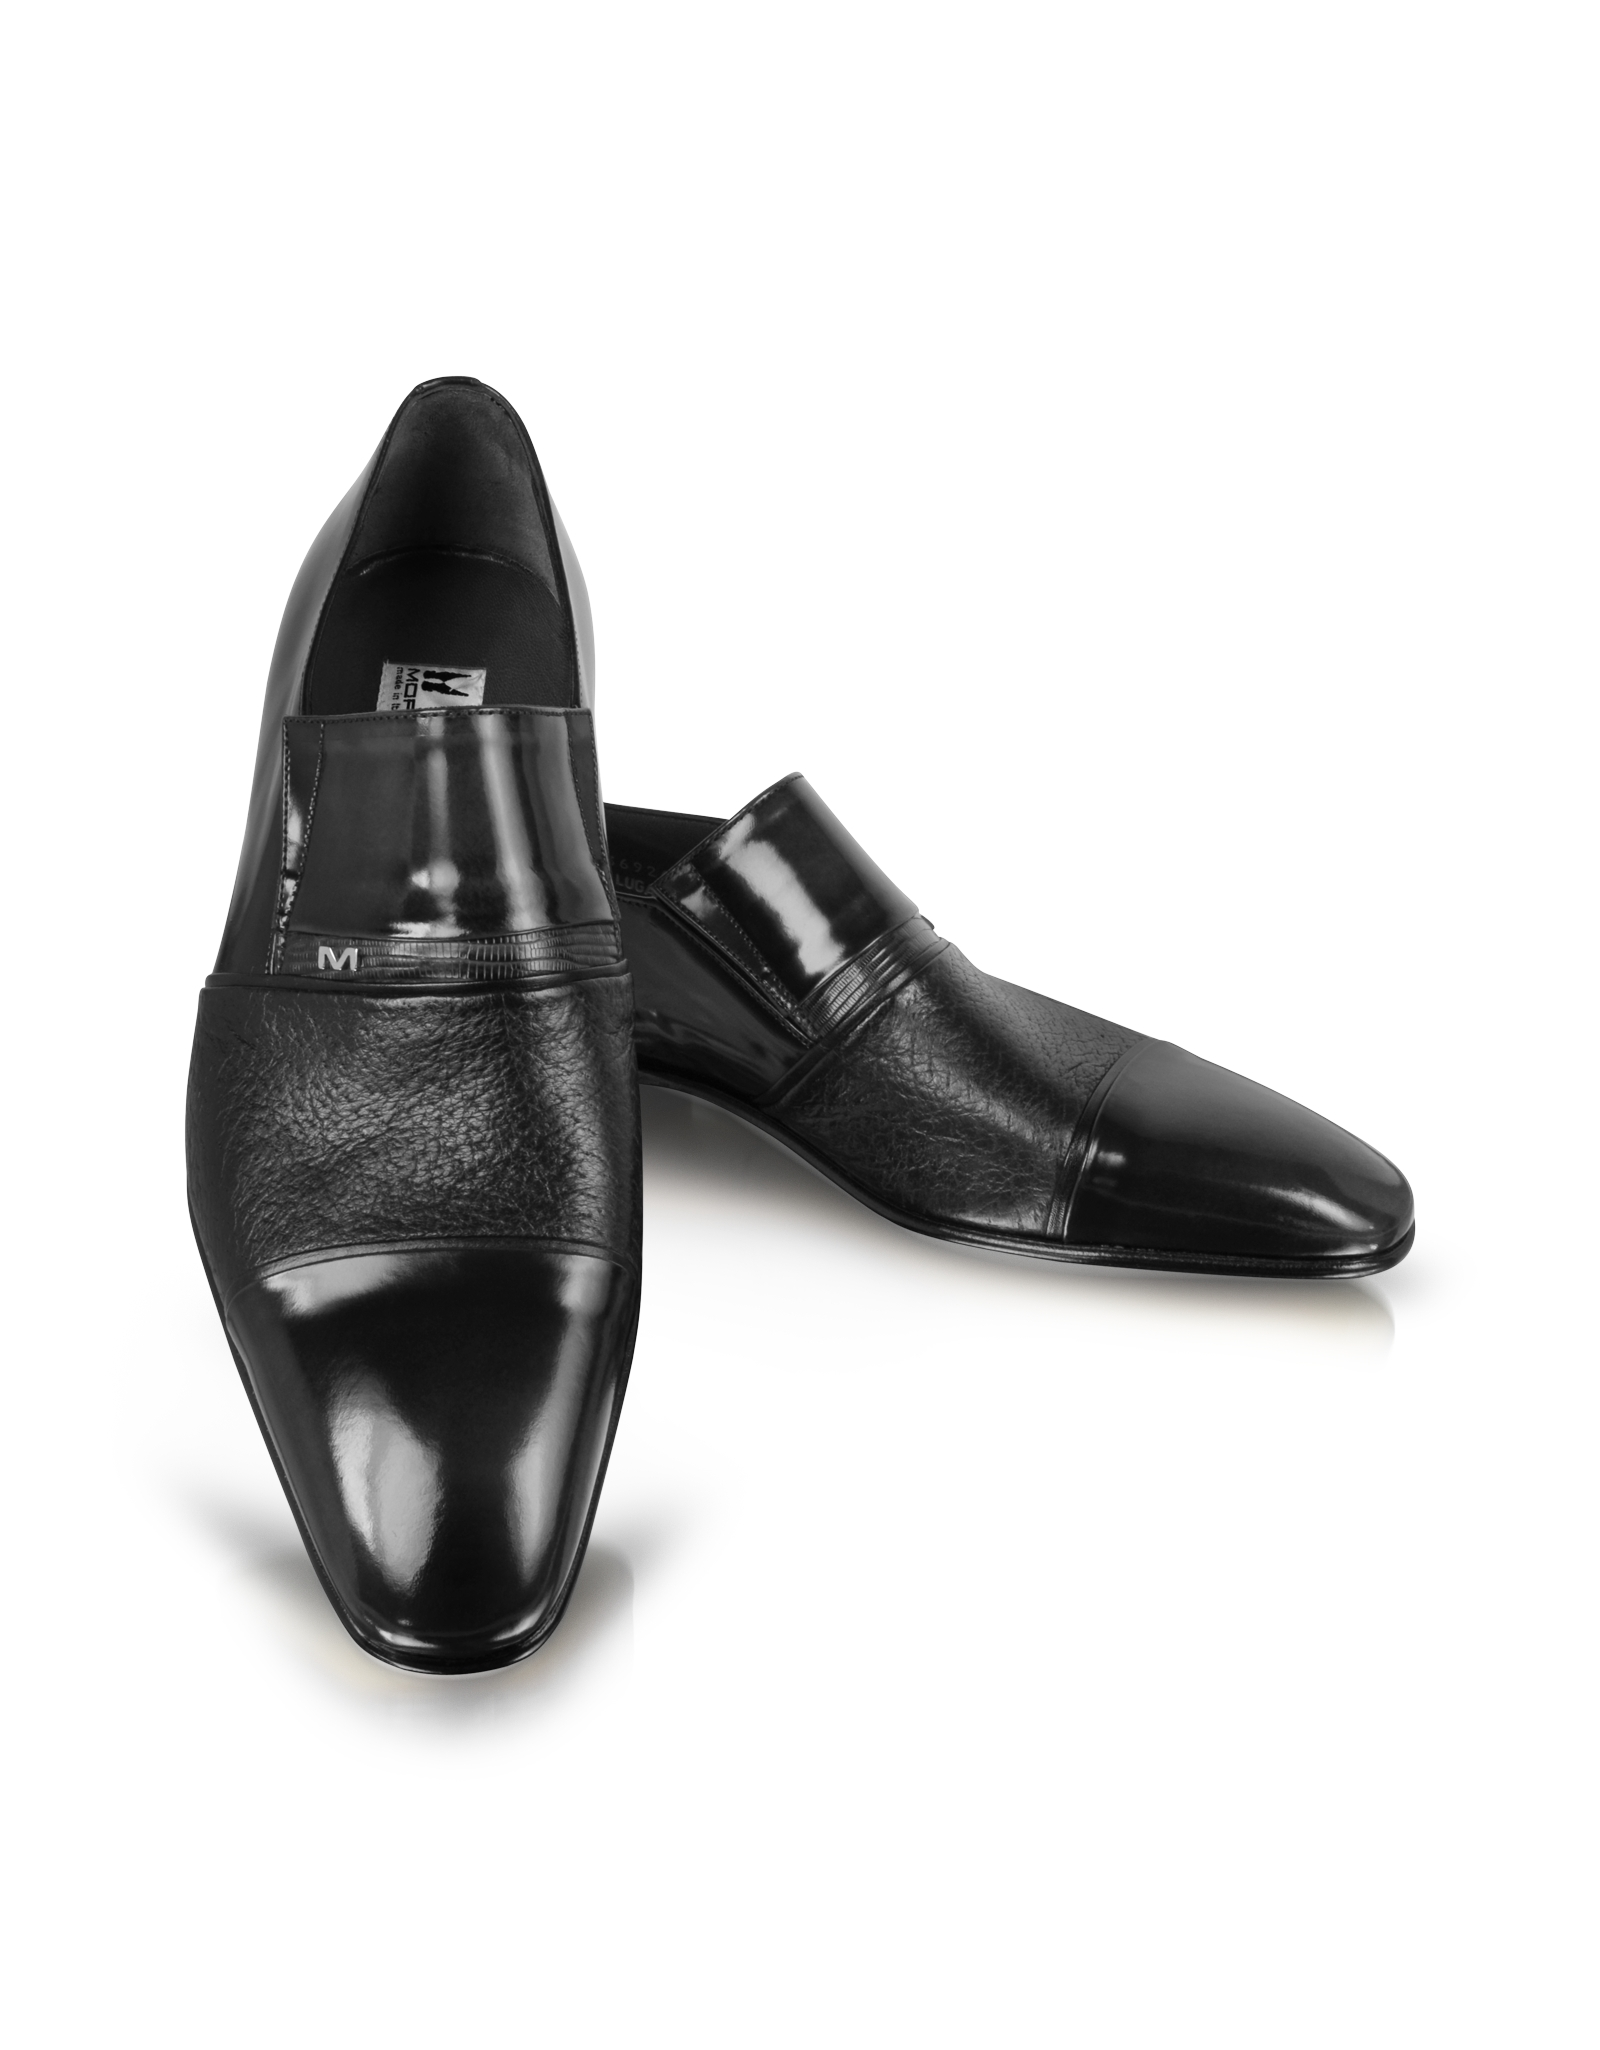 Loafer Shoes Australia Mens